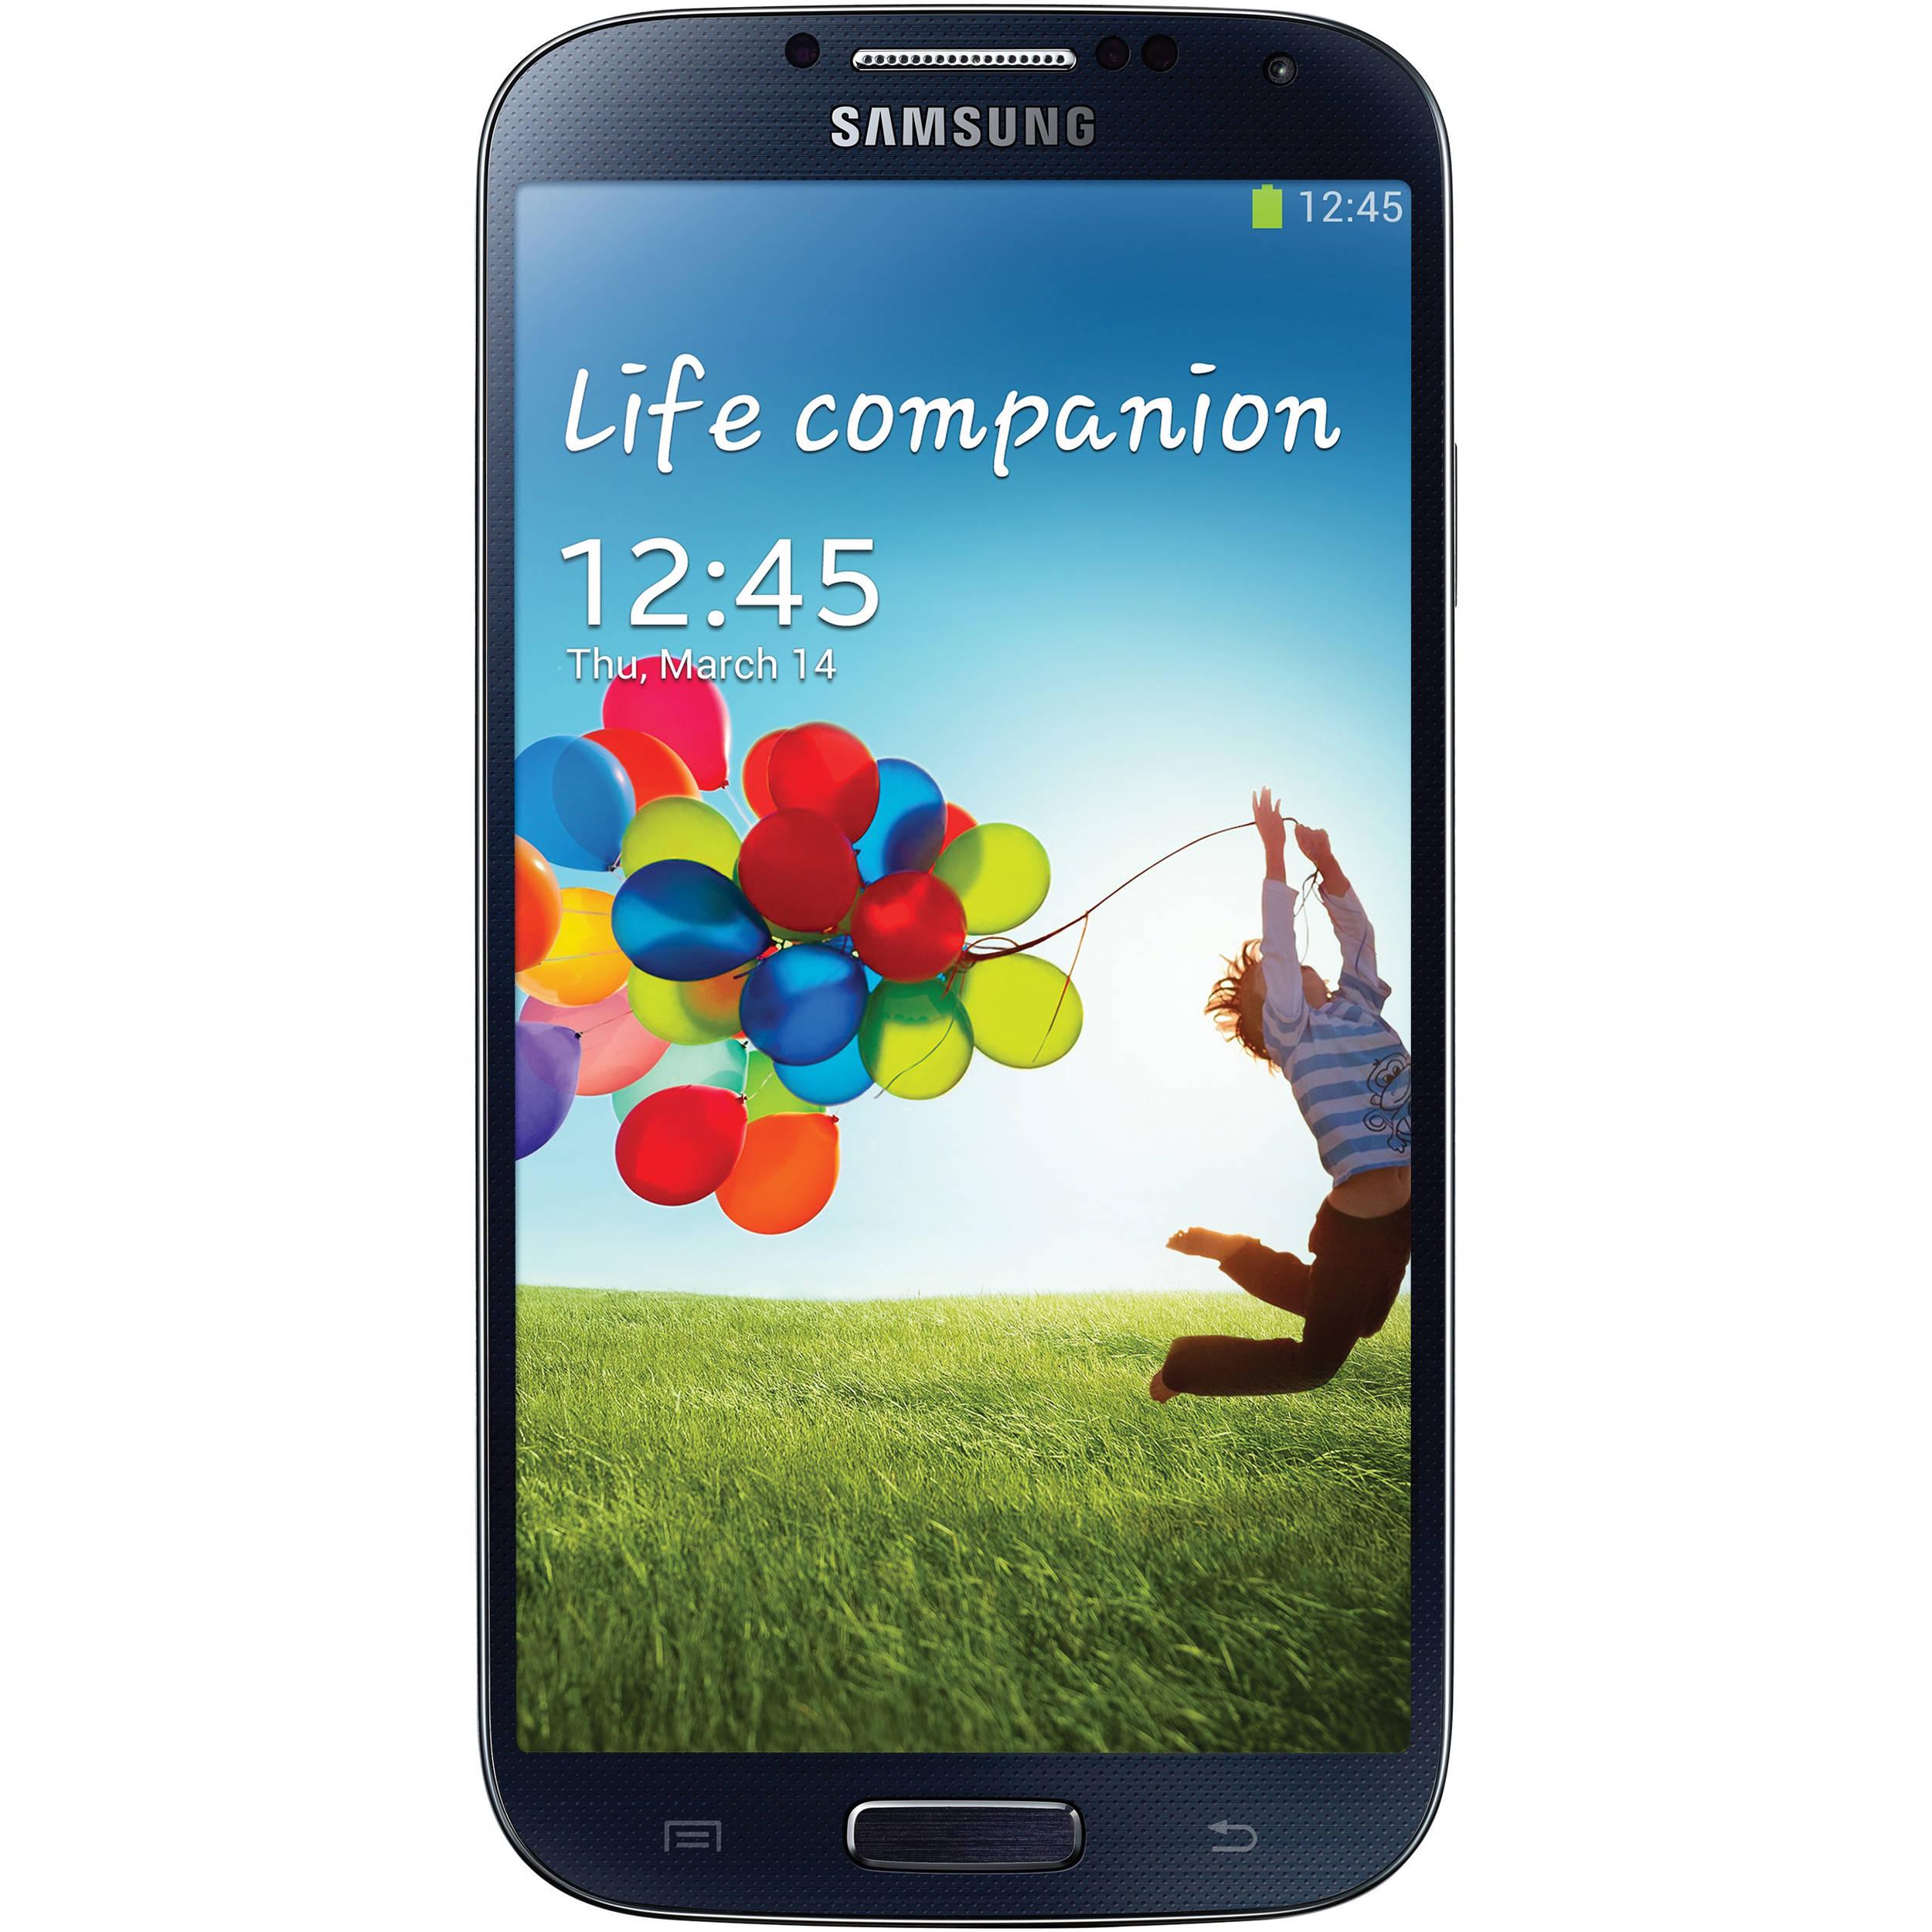 samsung galaxy s4 sgh i337 32gb at t branded i337 32gb black rh bhphotovideo com Walmart Android Phone AT&T HTC Tilt Phone